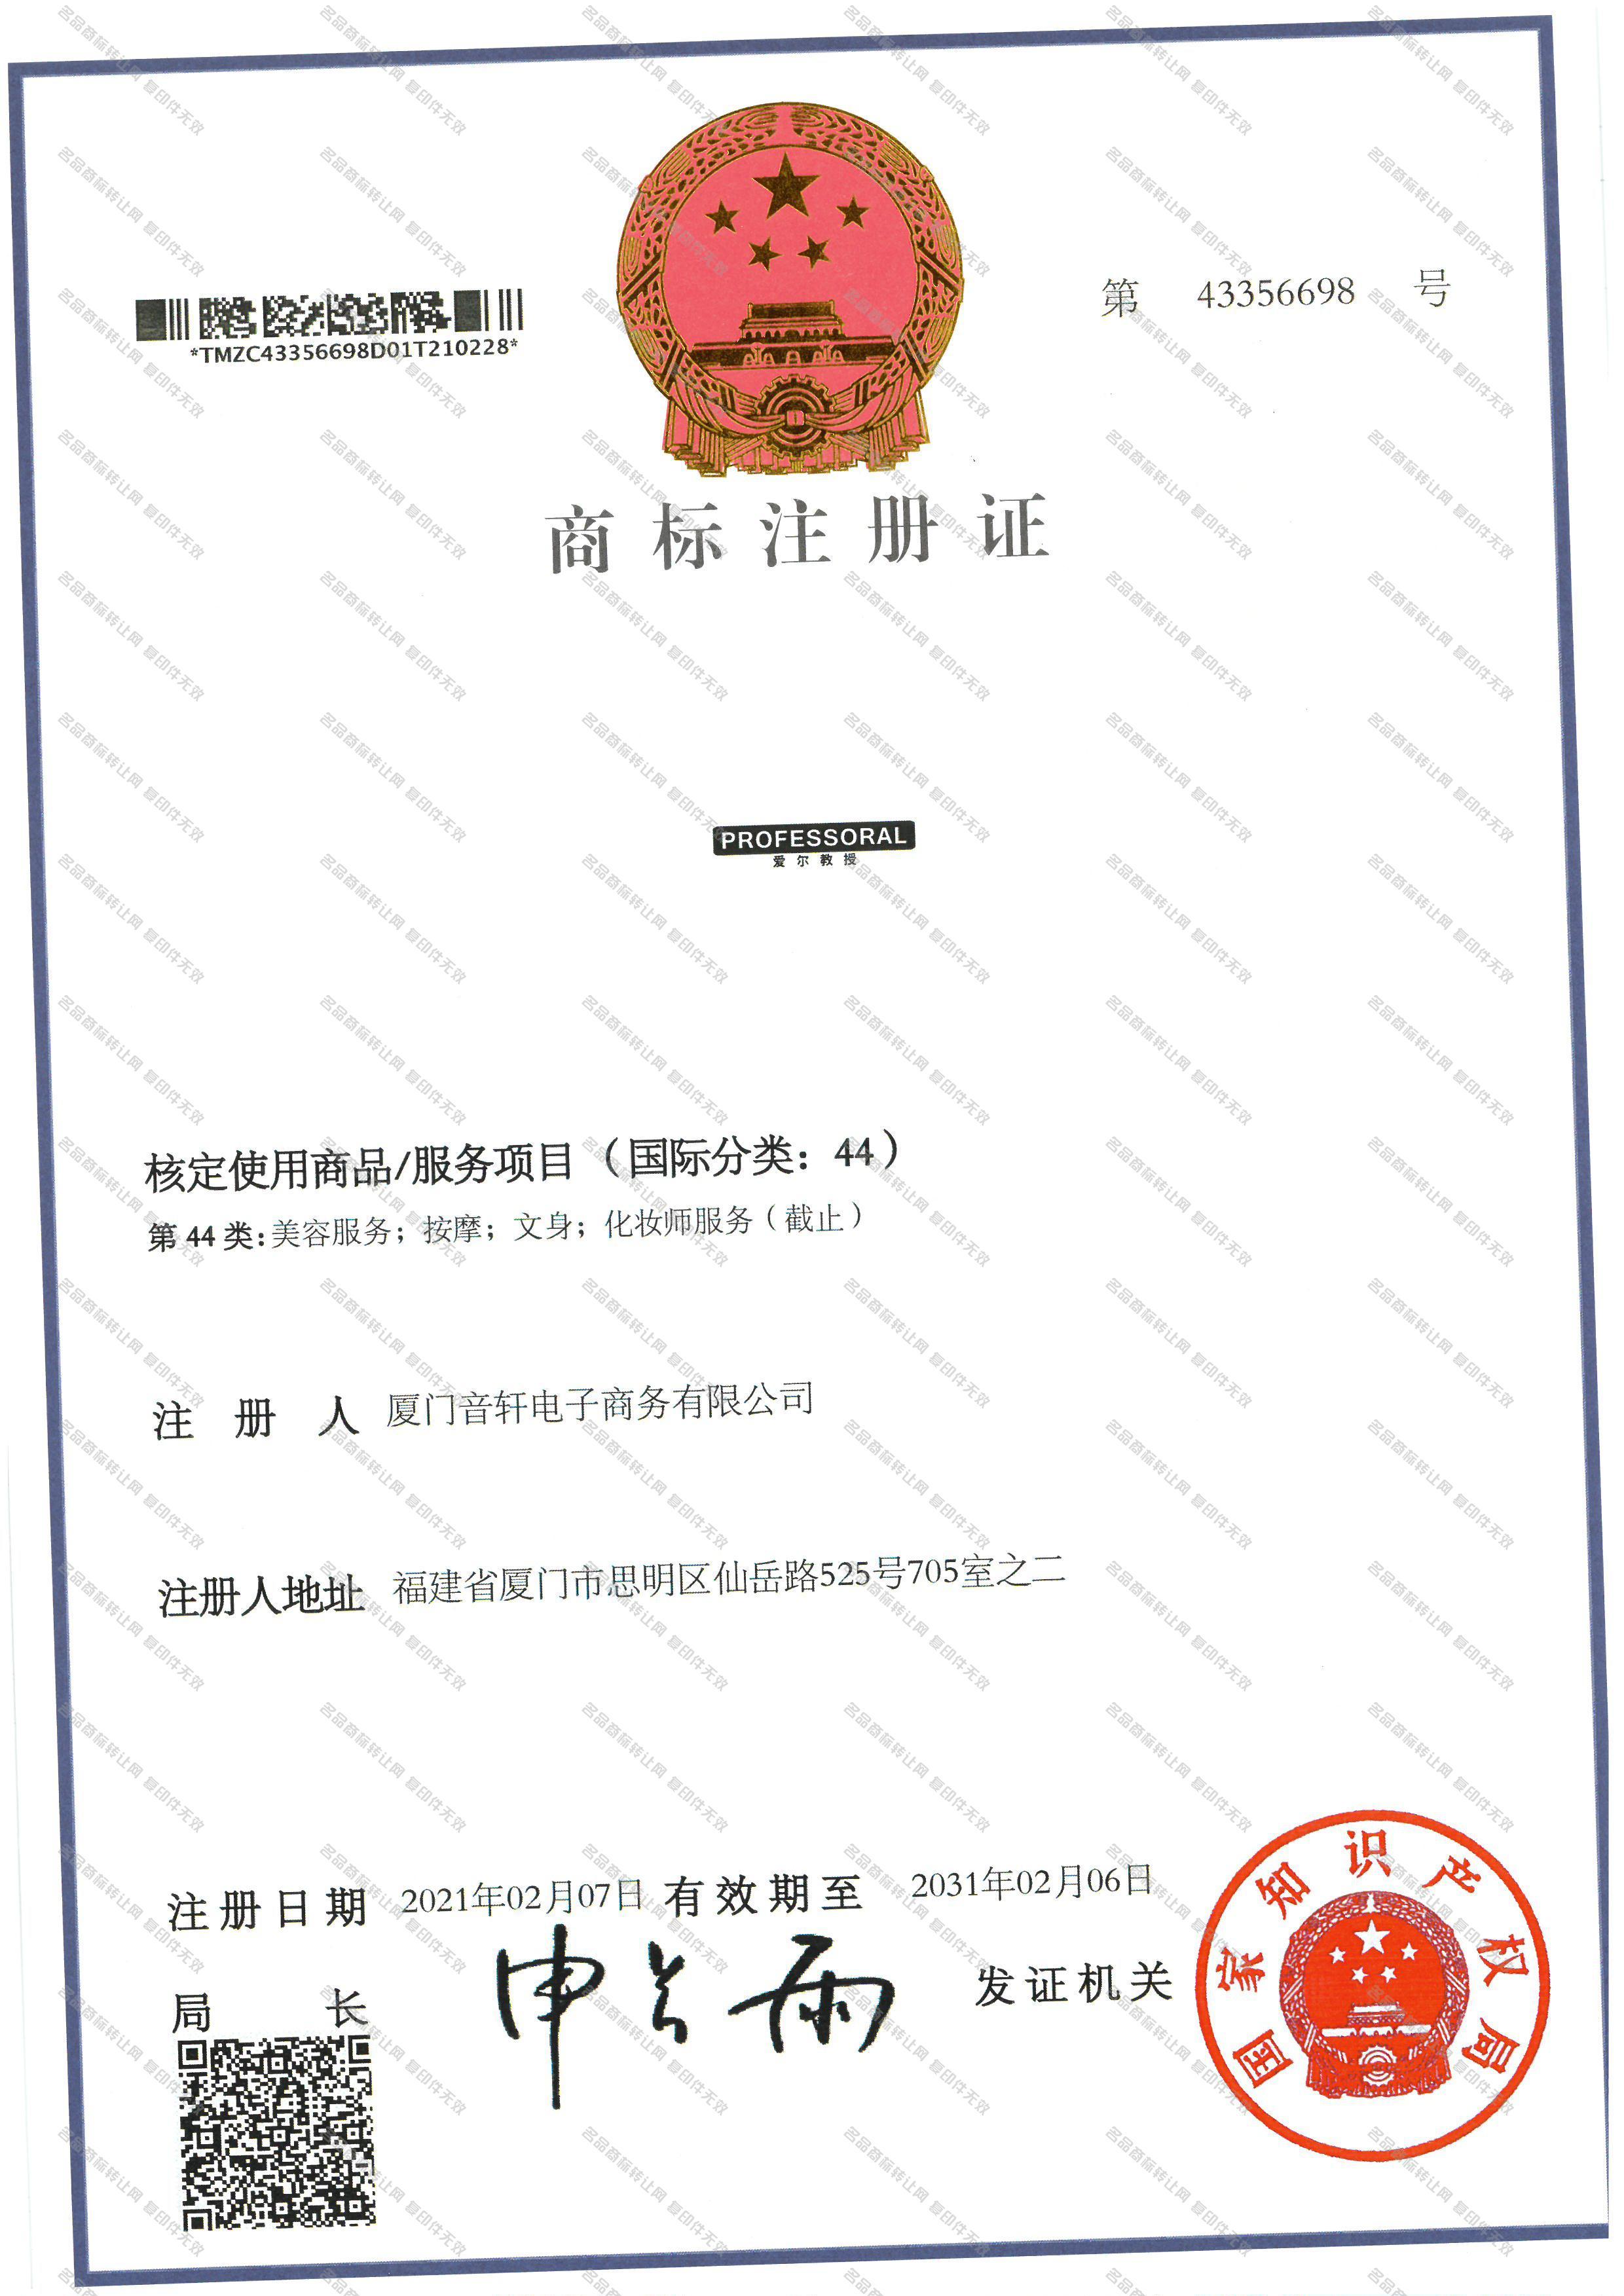 爱尔教授 PROFESSORAL注册证